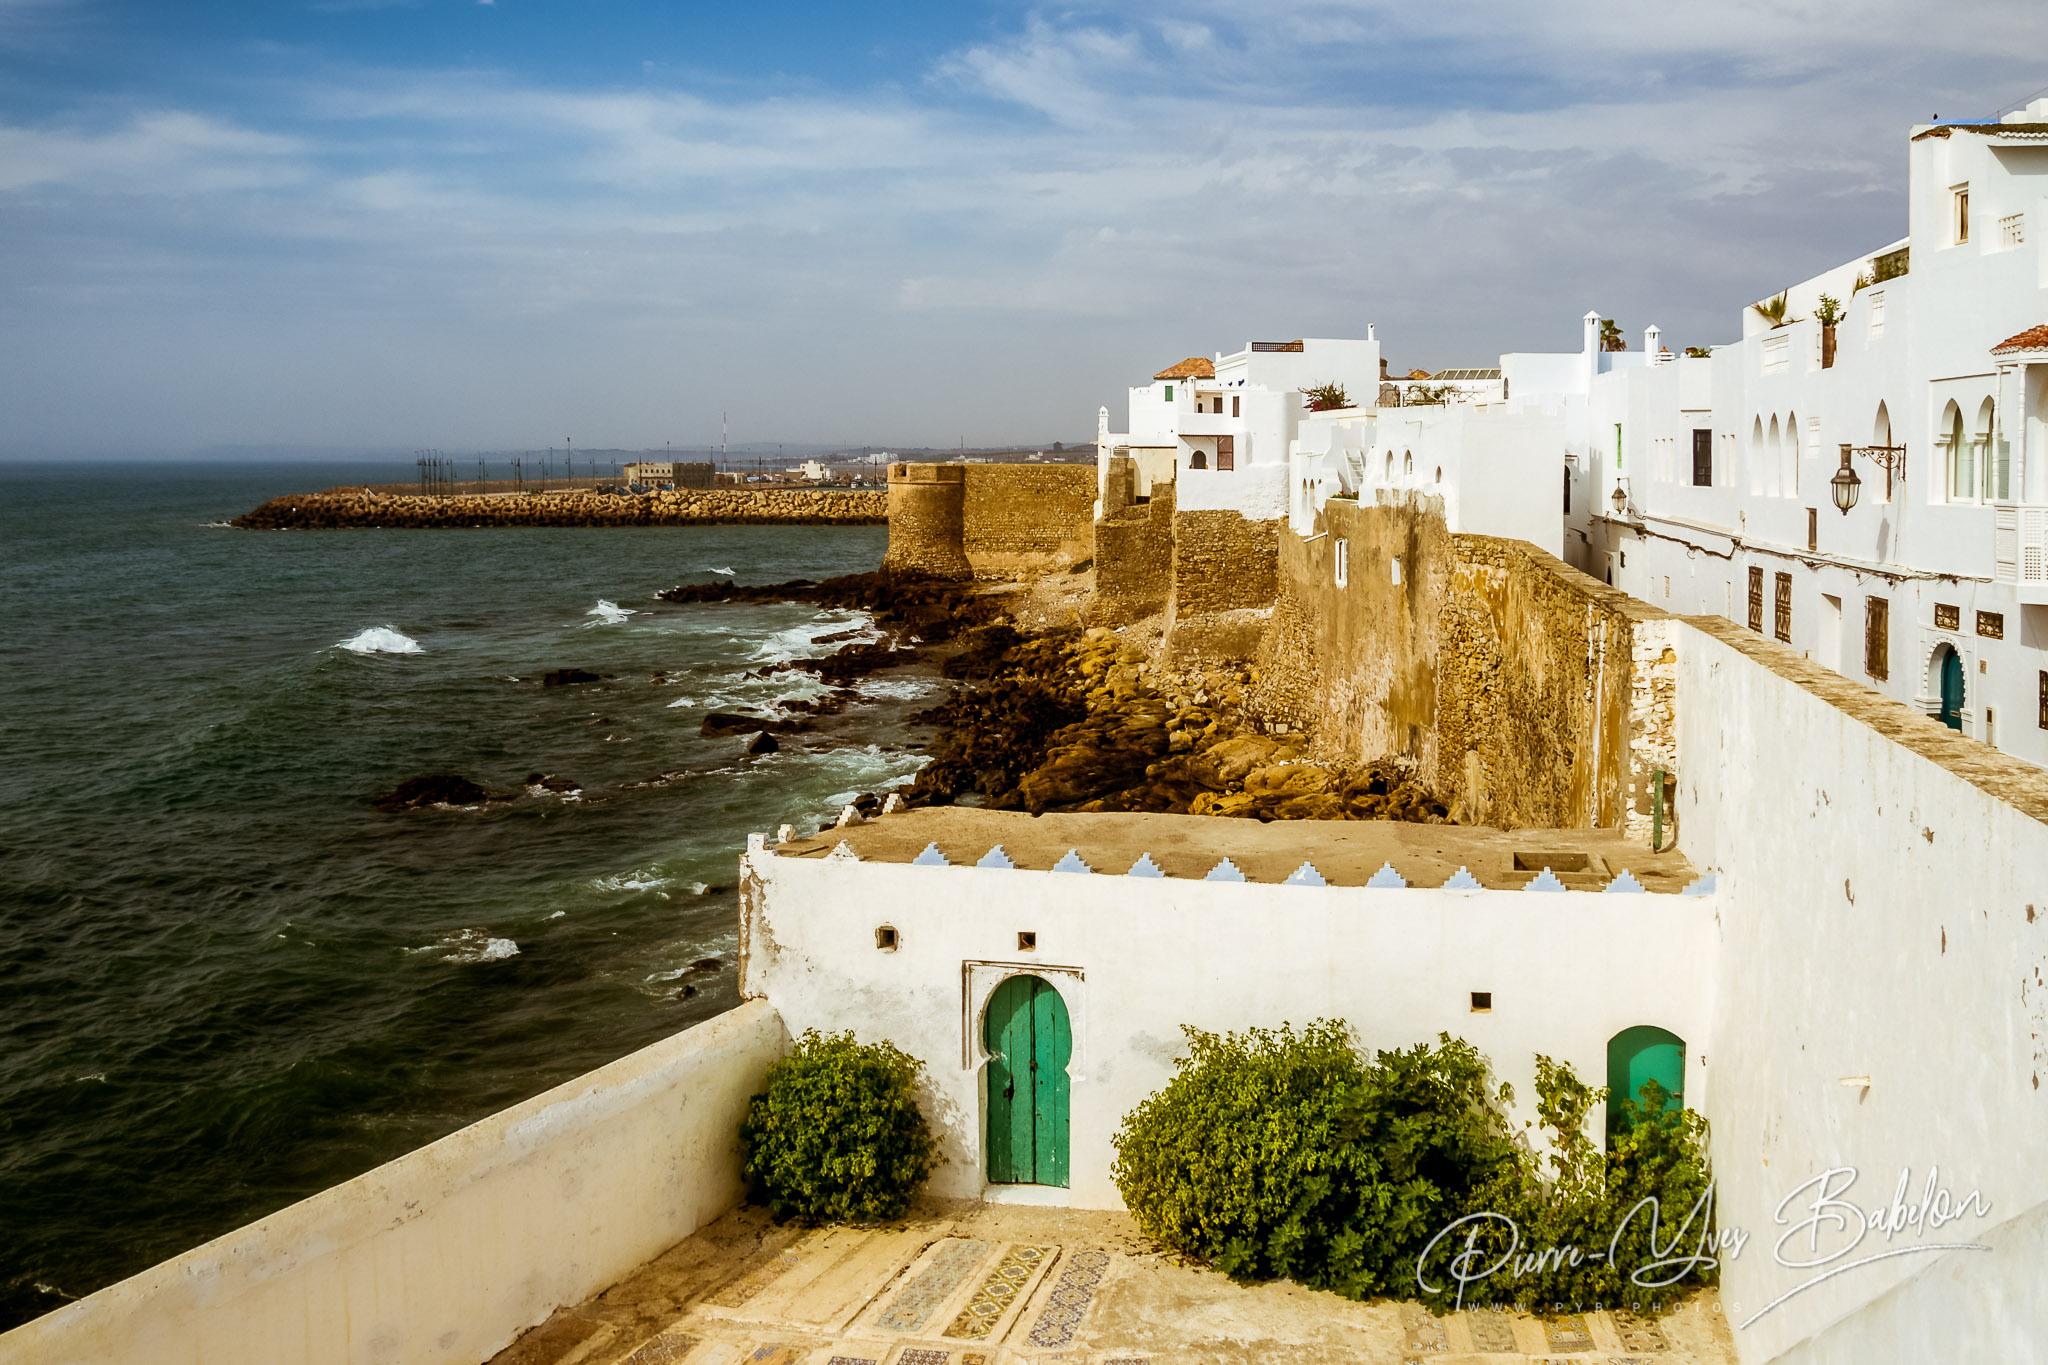 Ocean front of Asilah, Morocco